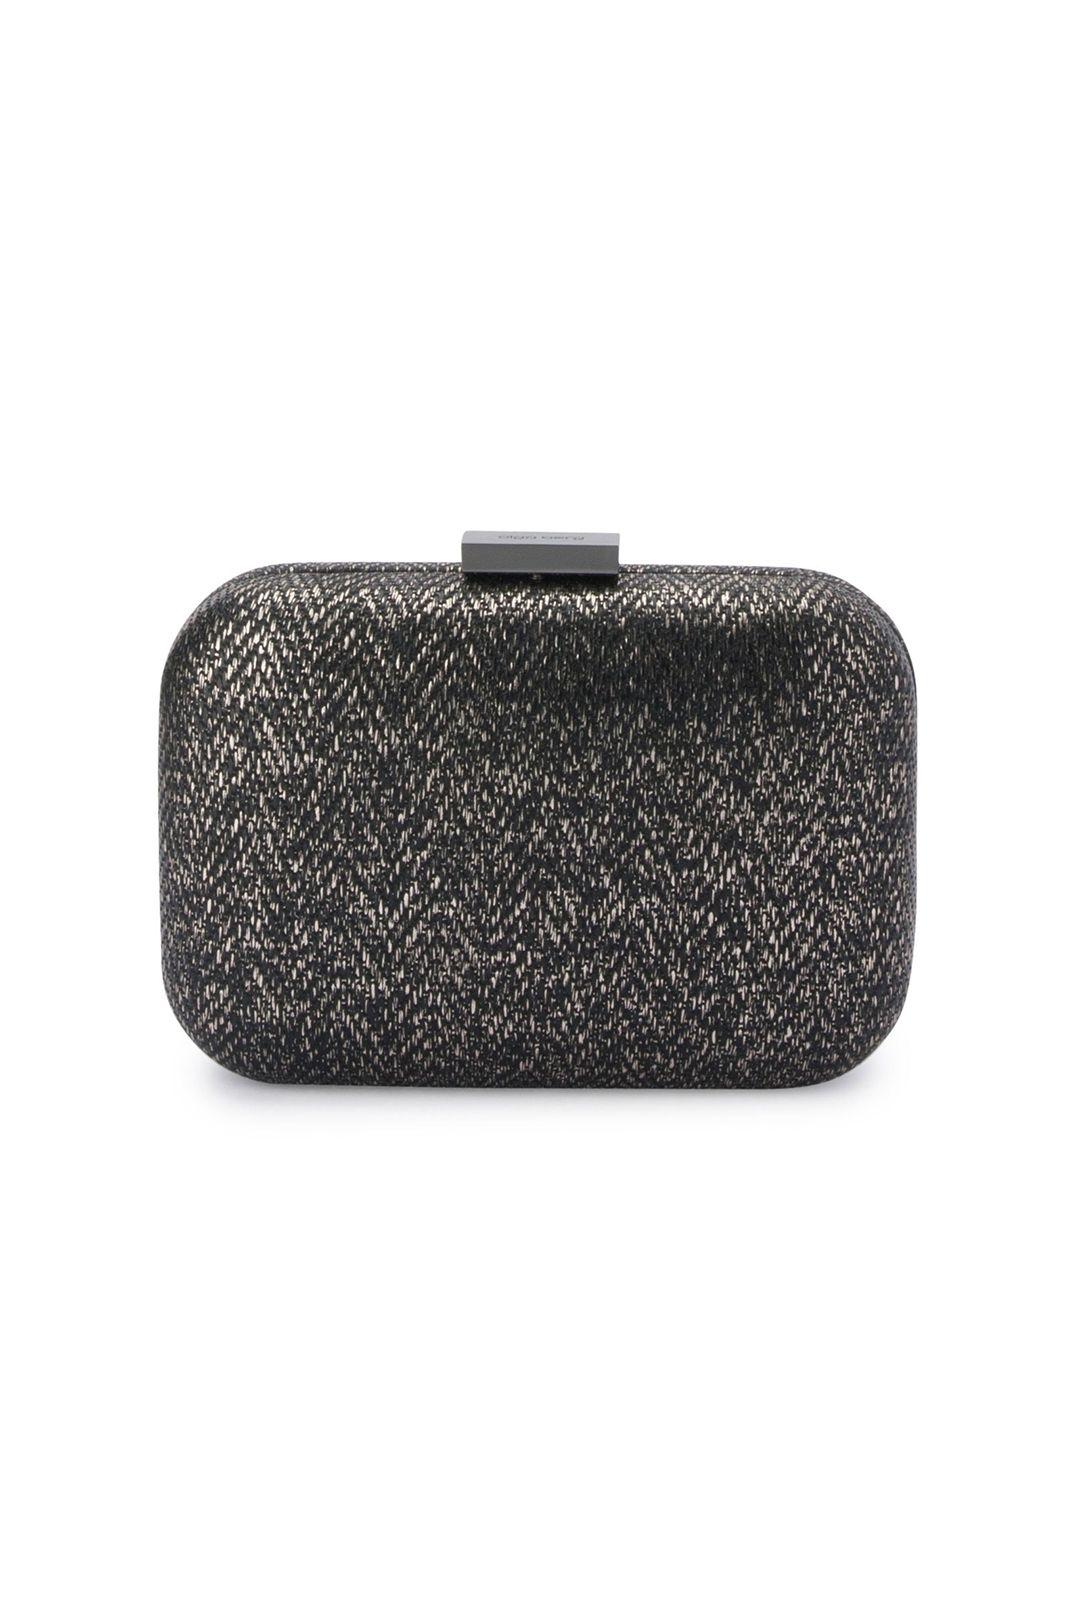 Olga Berg - Ana Woven Metallic Clutch - Black - Product